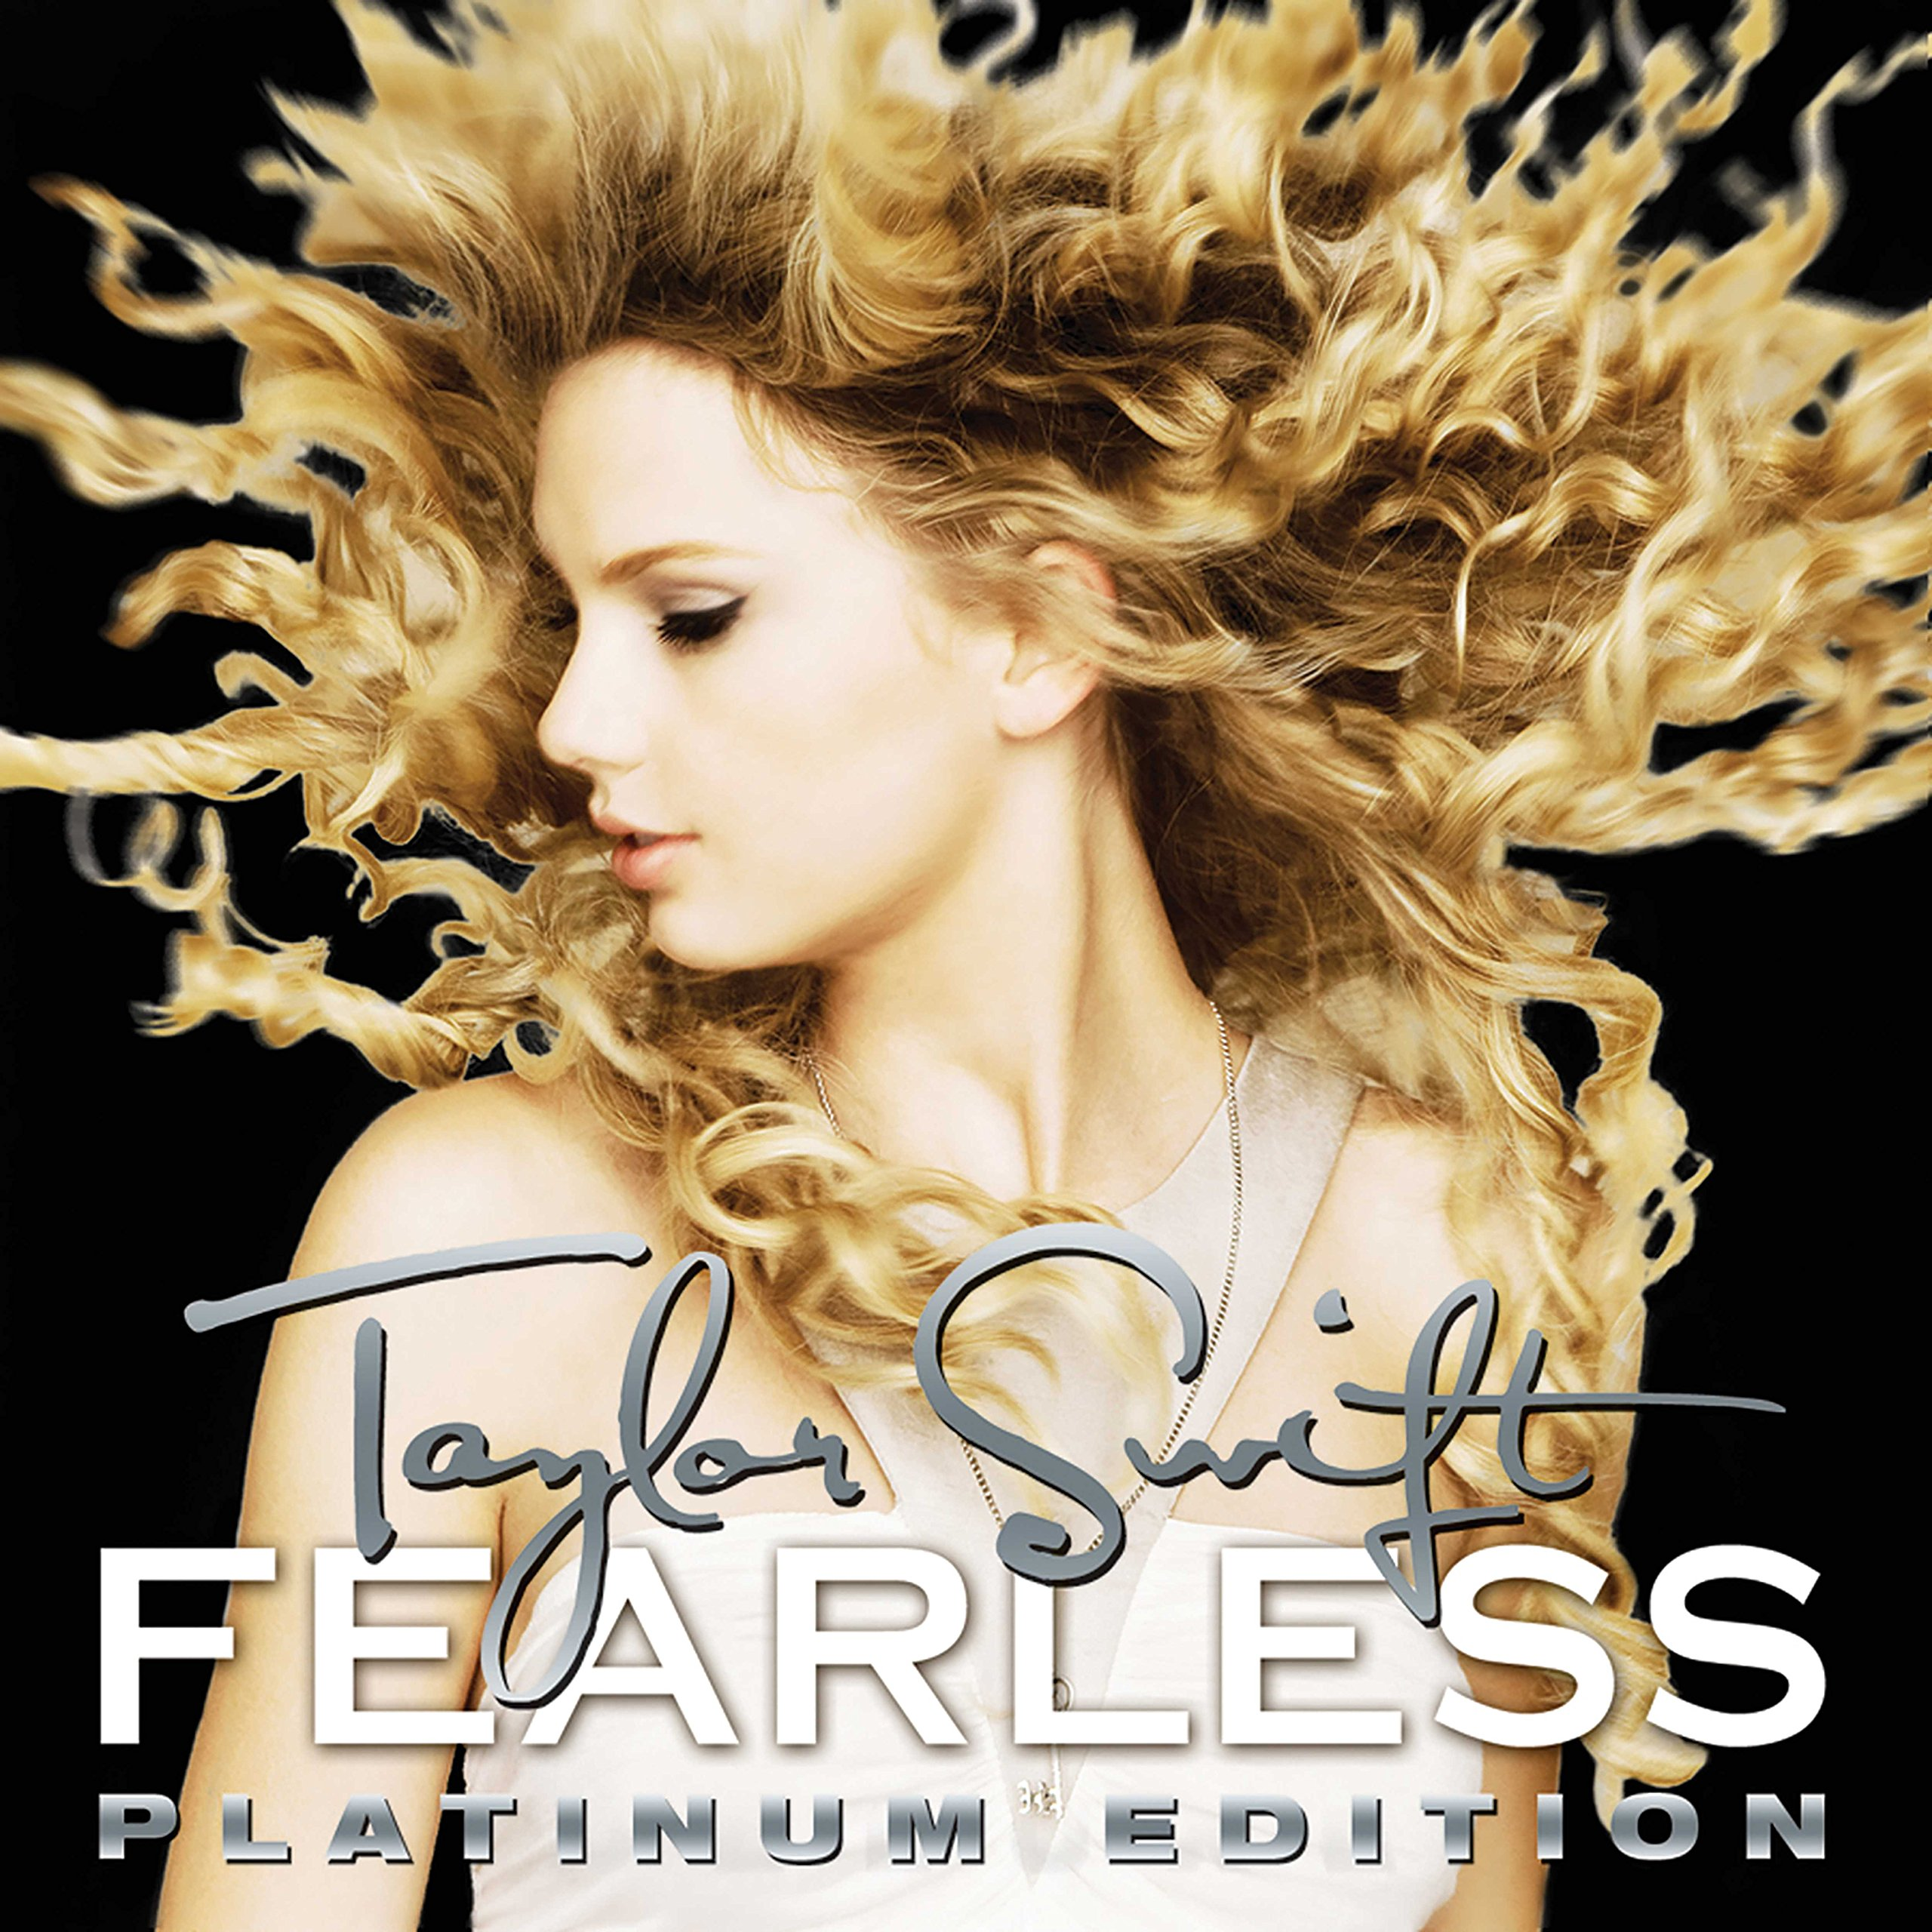 Fearless [VINYL] (Platinum Edition)